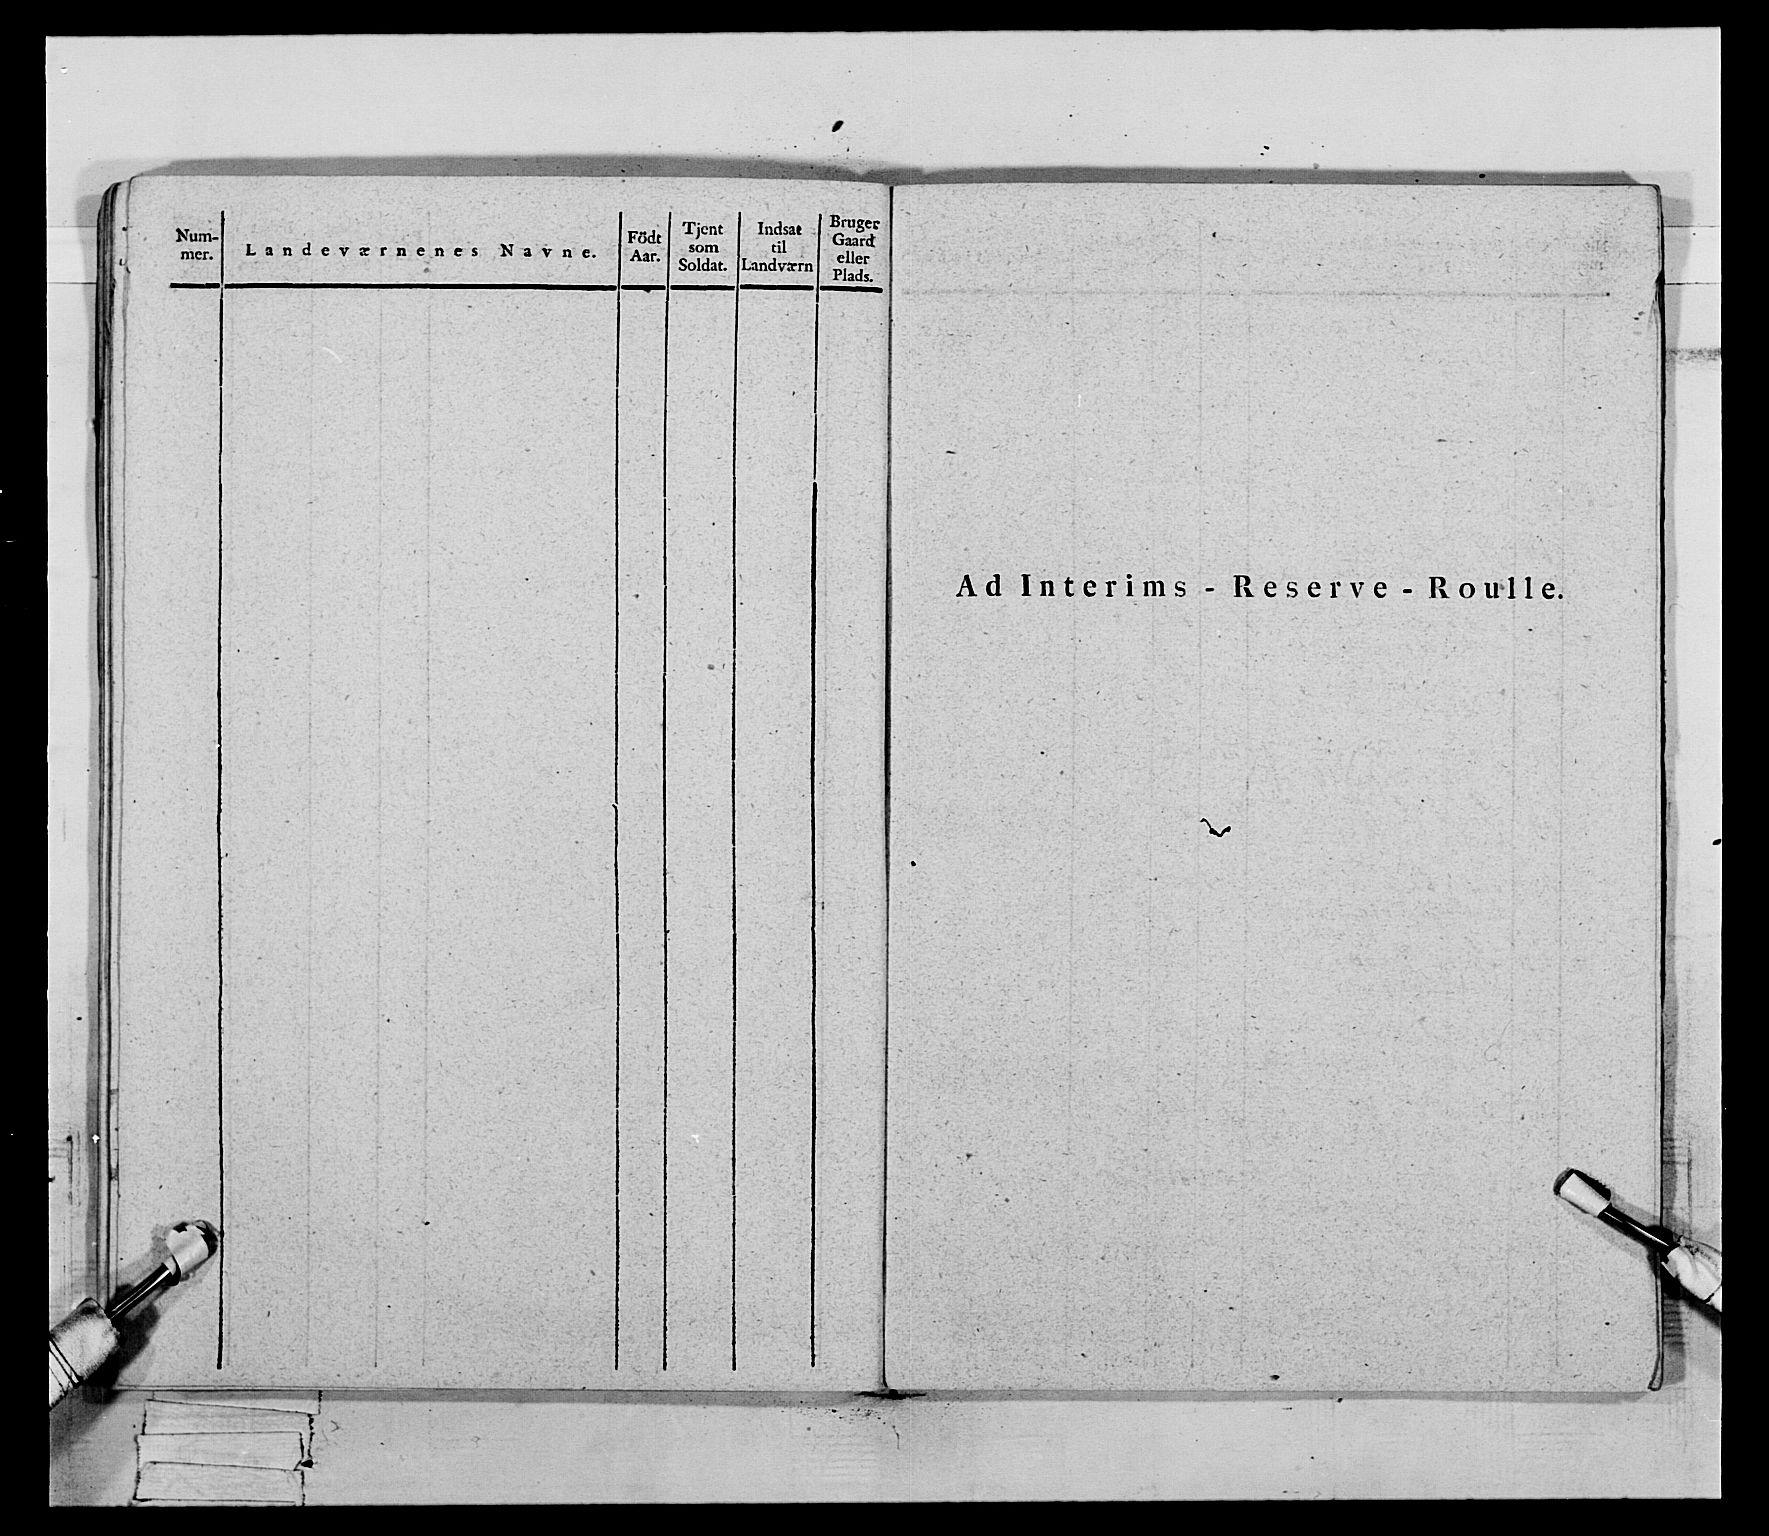 RA, Generalitets- og kommissariatskollegiet, Det kongelige norske kommissariatskollegium, E/Eh/L0069: Opplandske gevorbne infanteriregiment, 1810-1818, s. 652